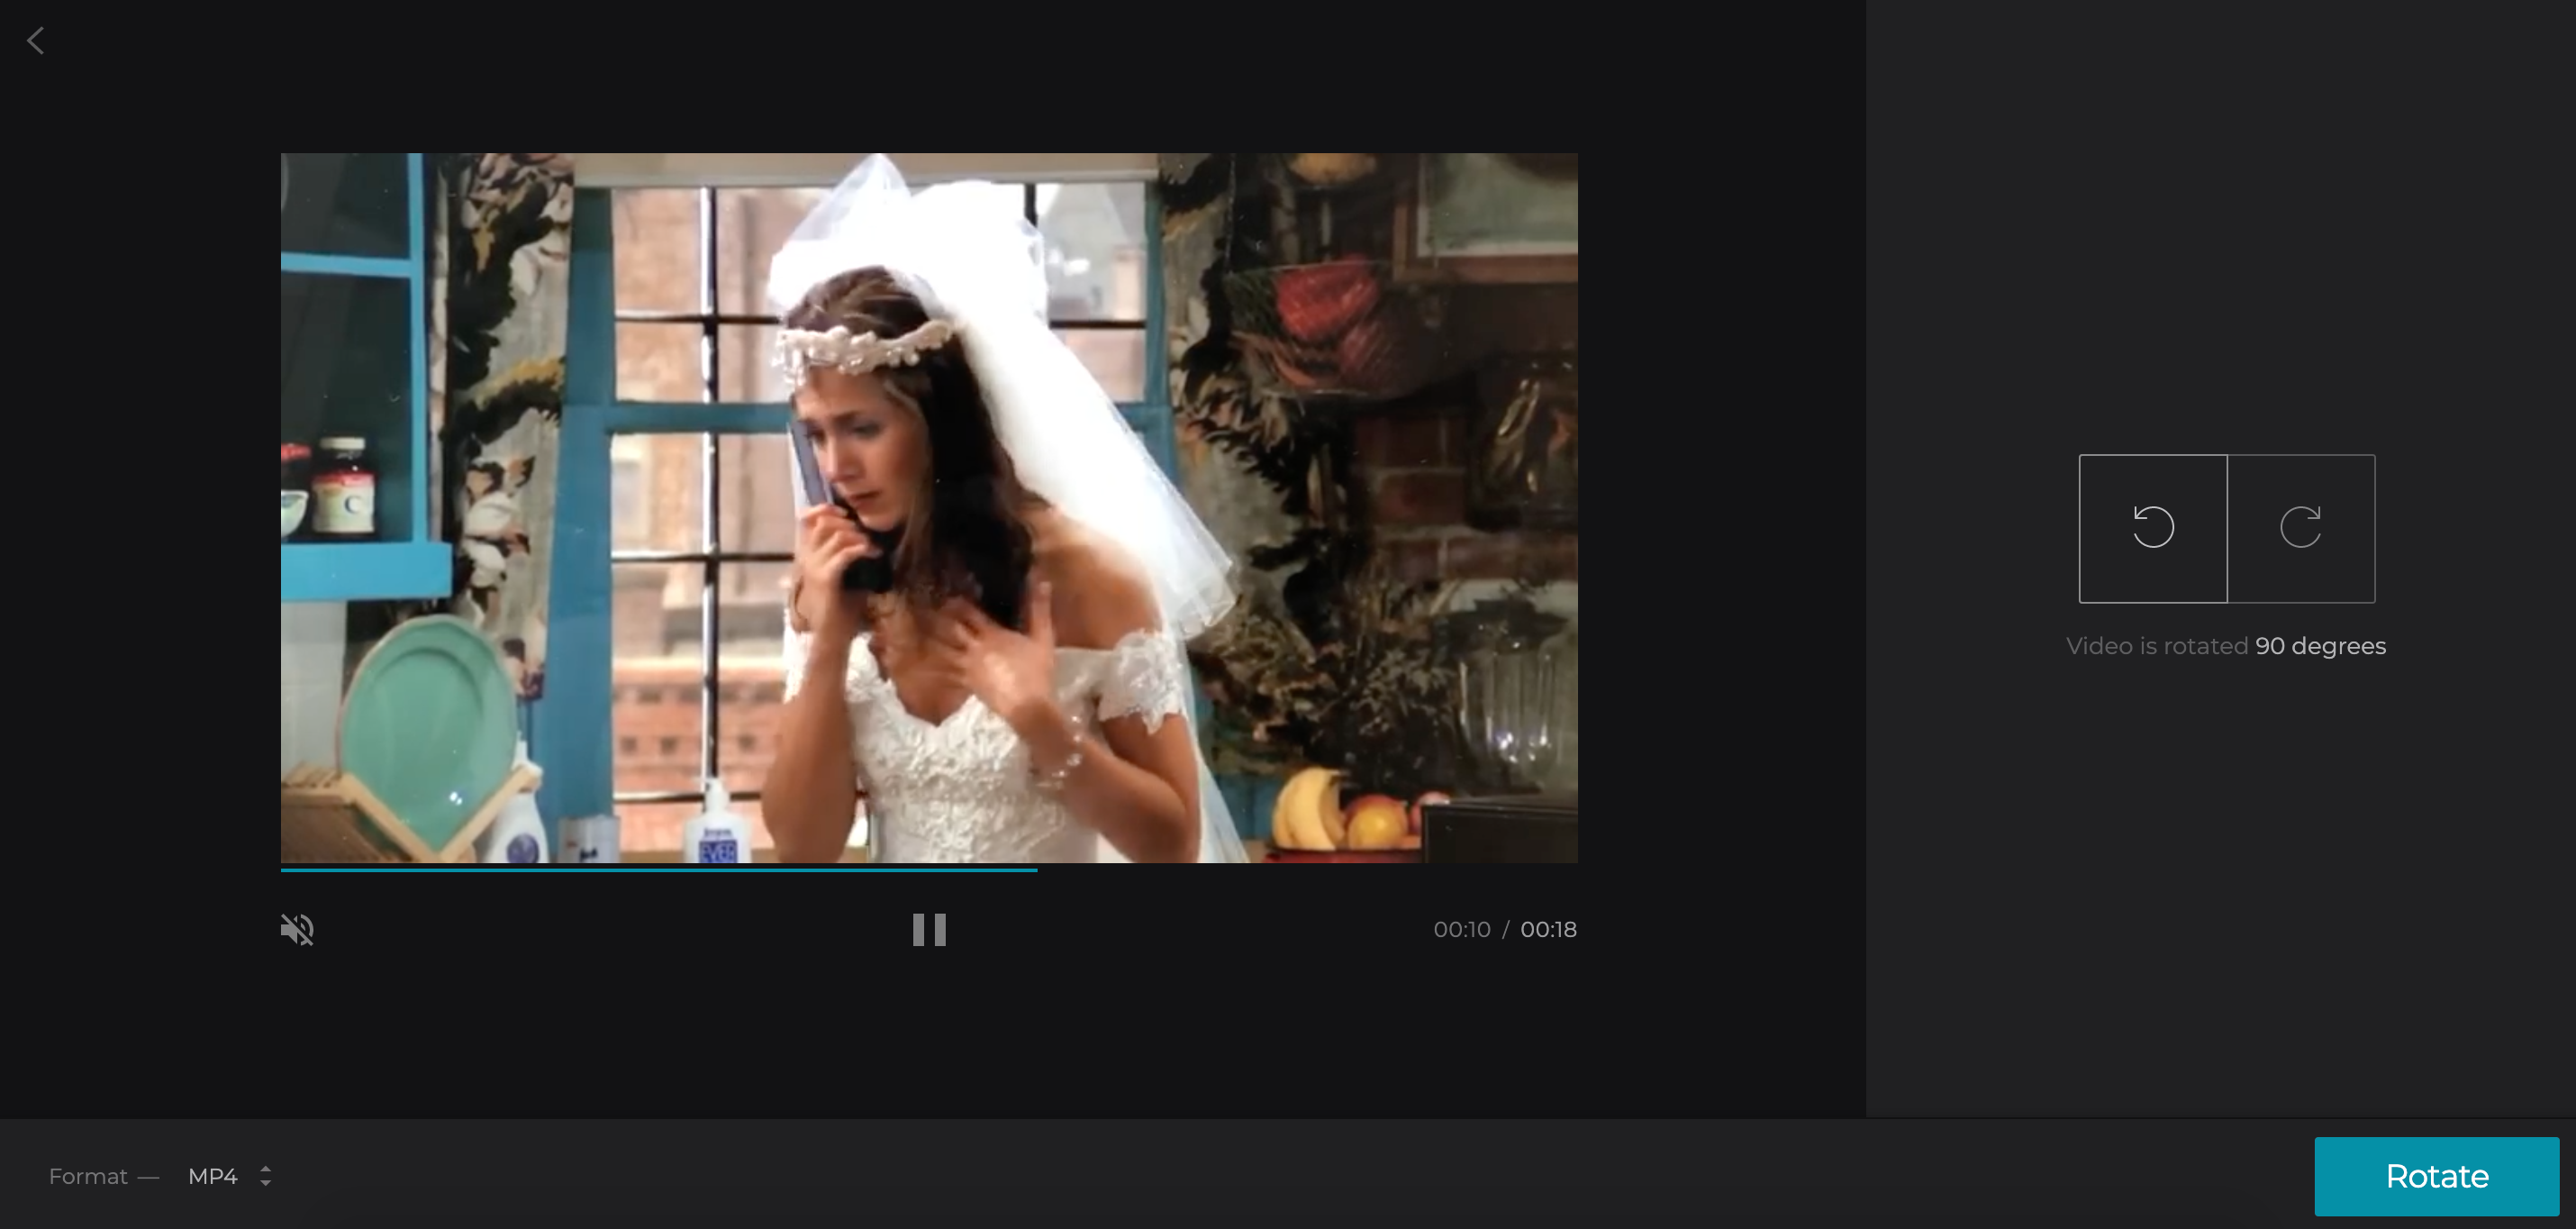 Rotate video on Windows